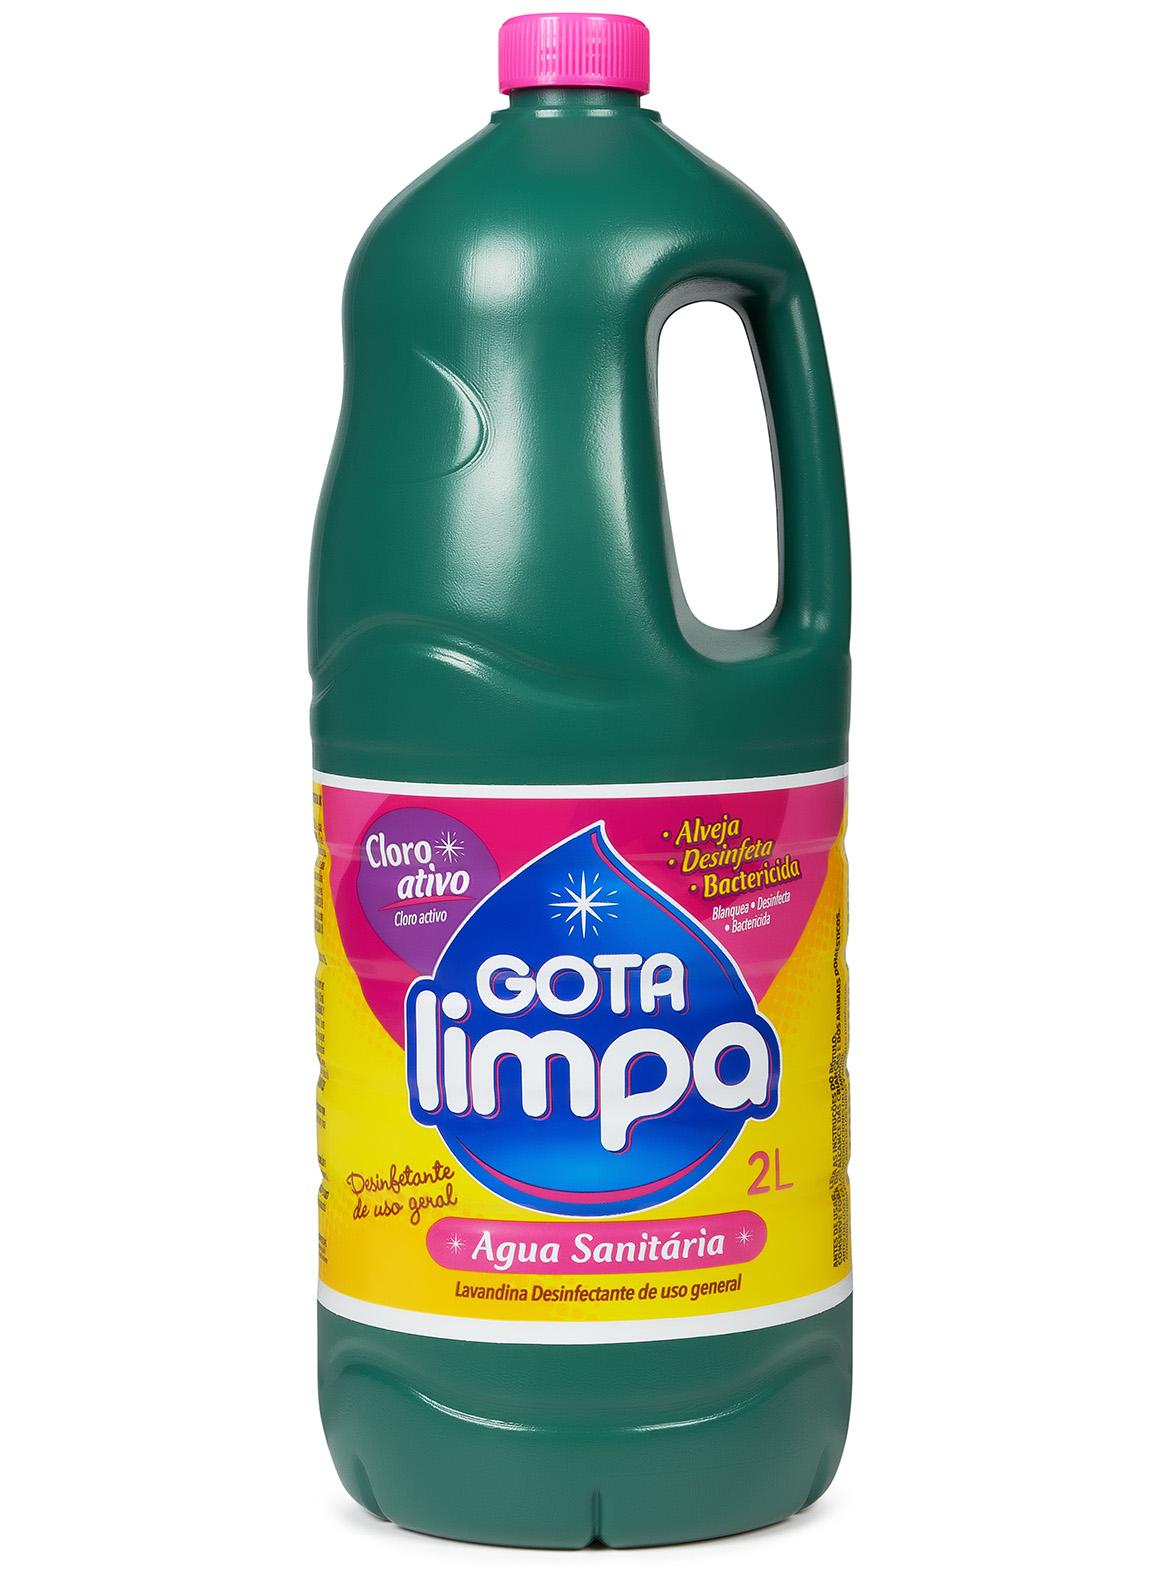 Água Sanitária Gota Limpa 2L